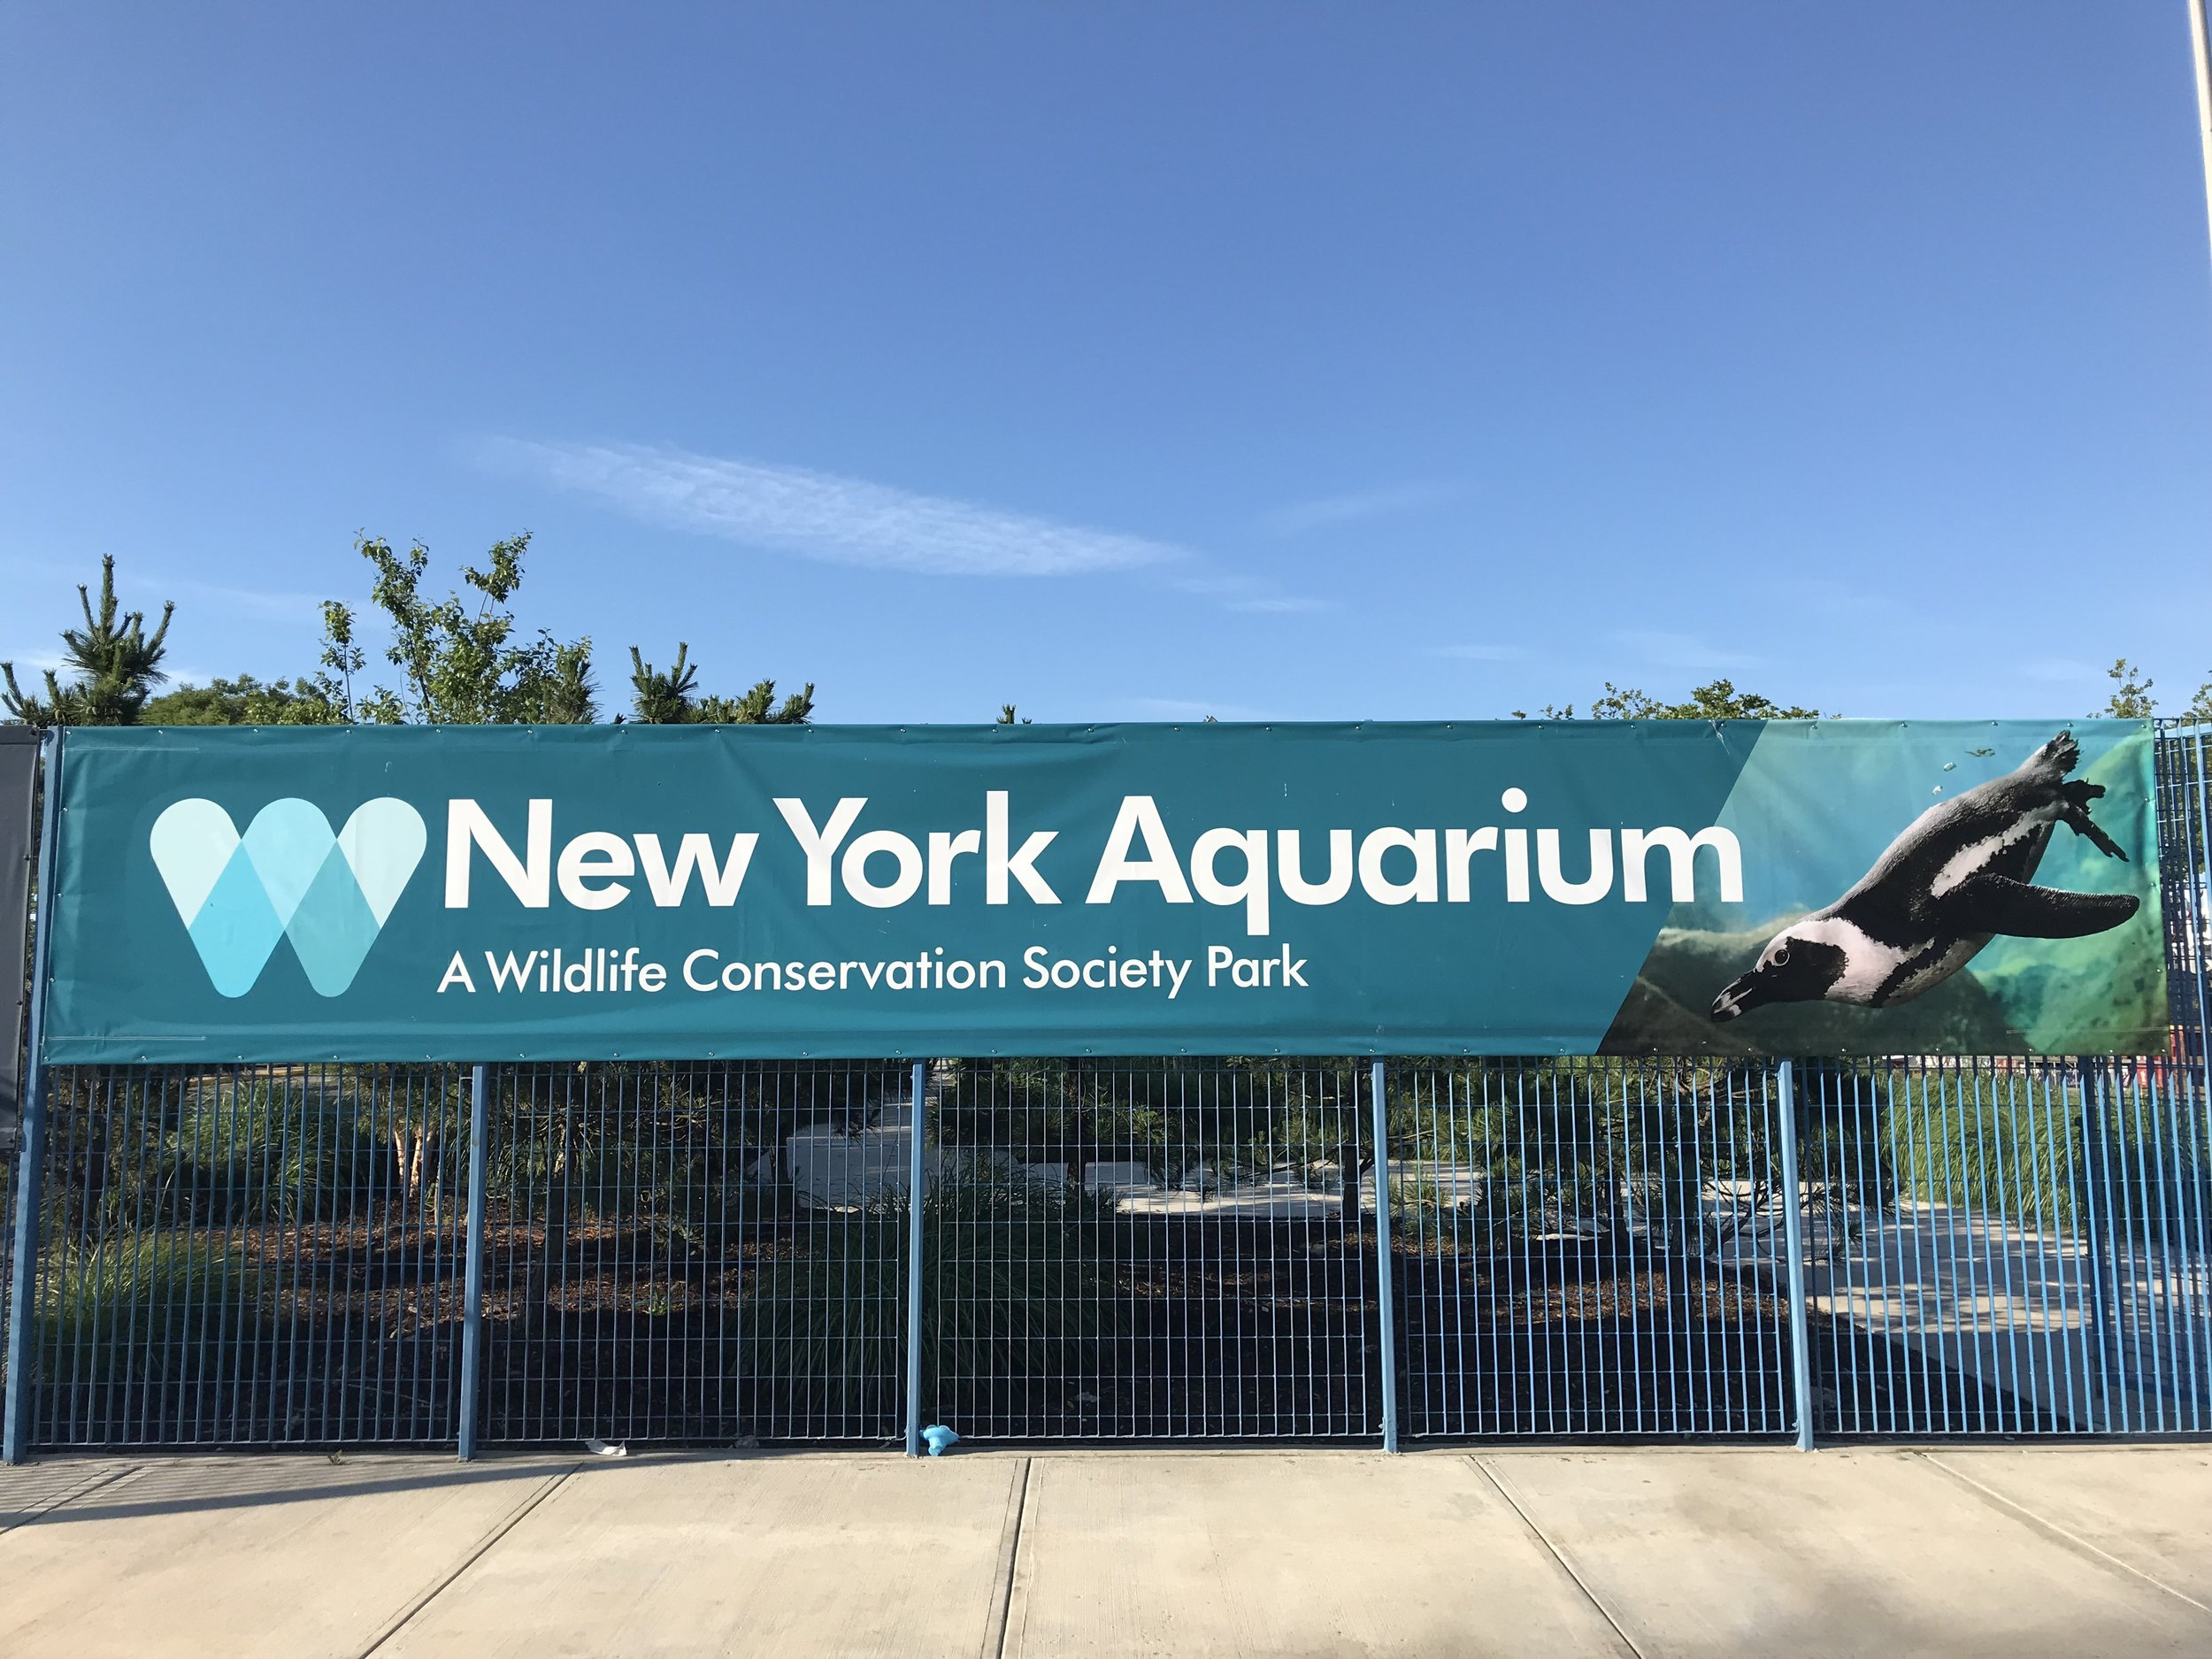 Welcome to the New York Aquarium